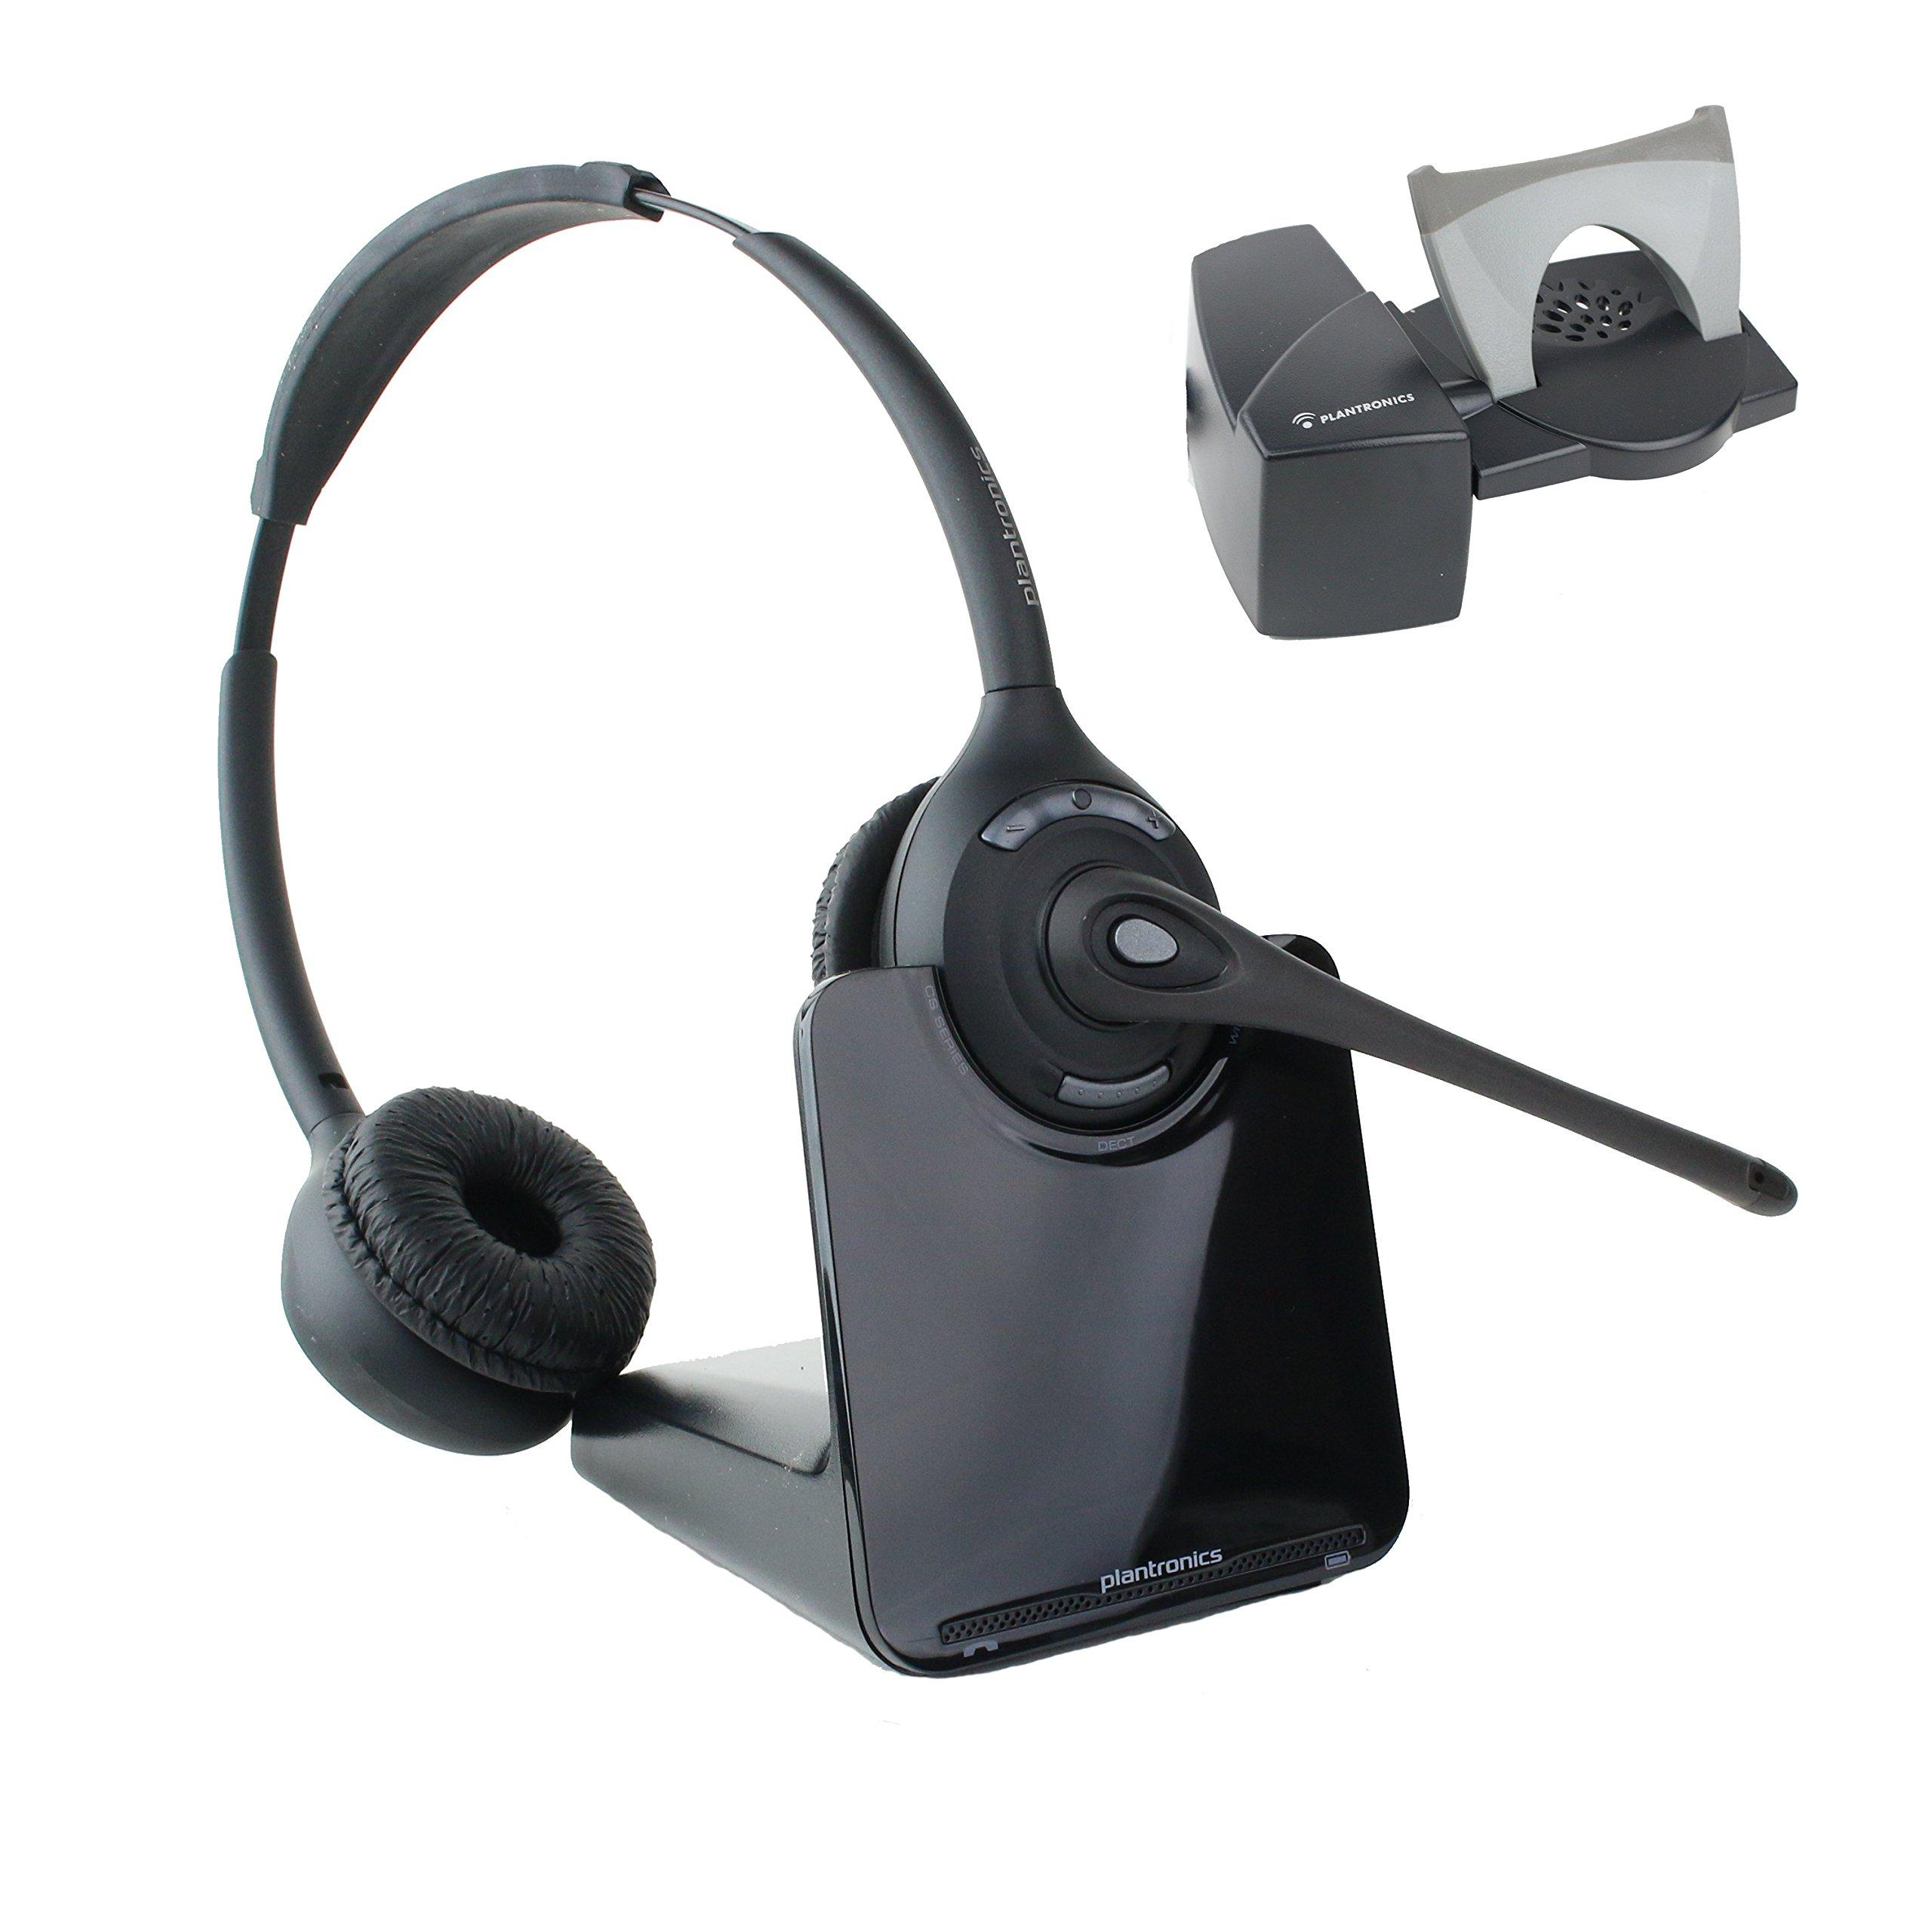 Plantronics CS520 Binaural Wireless Office Headset With Lifter (Certified Refurbished)